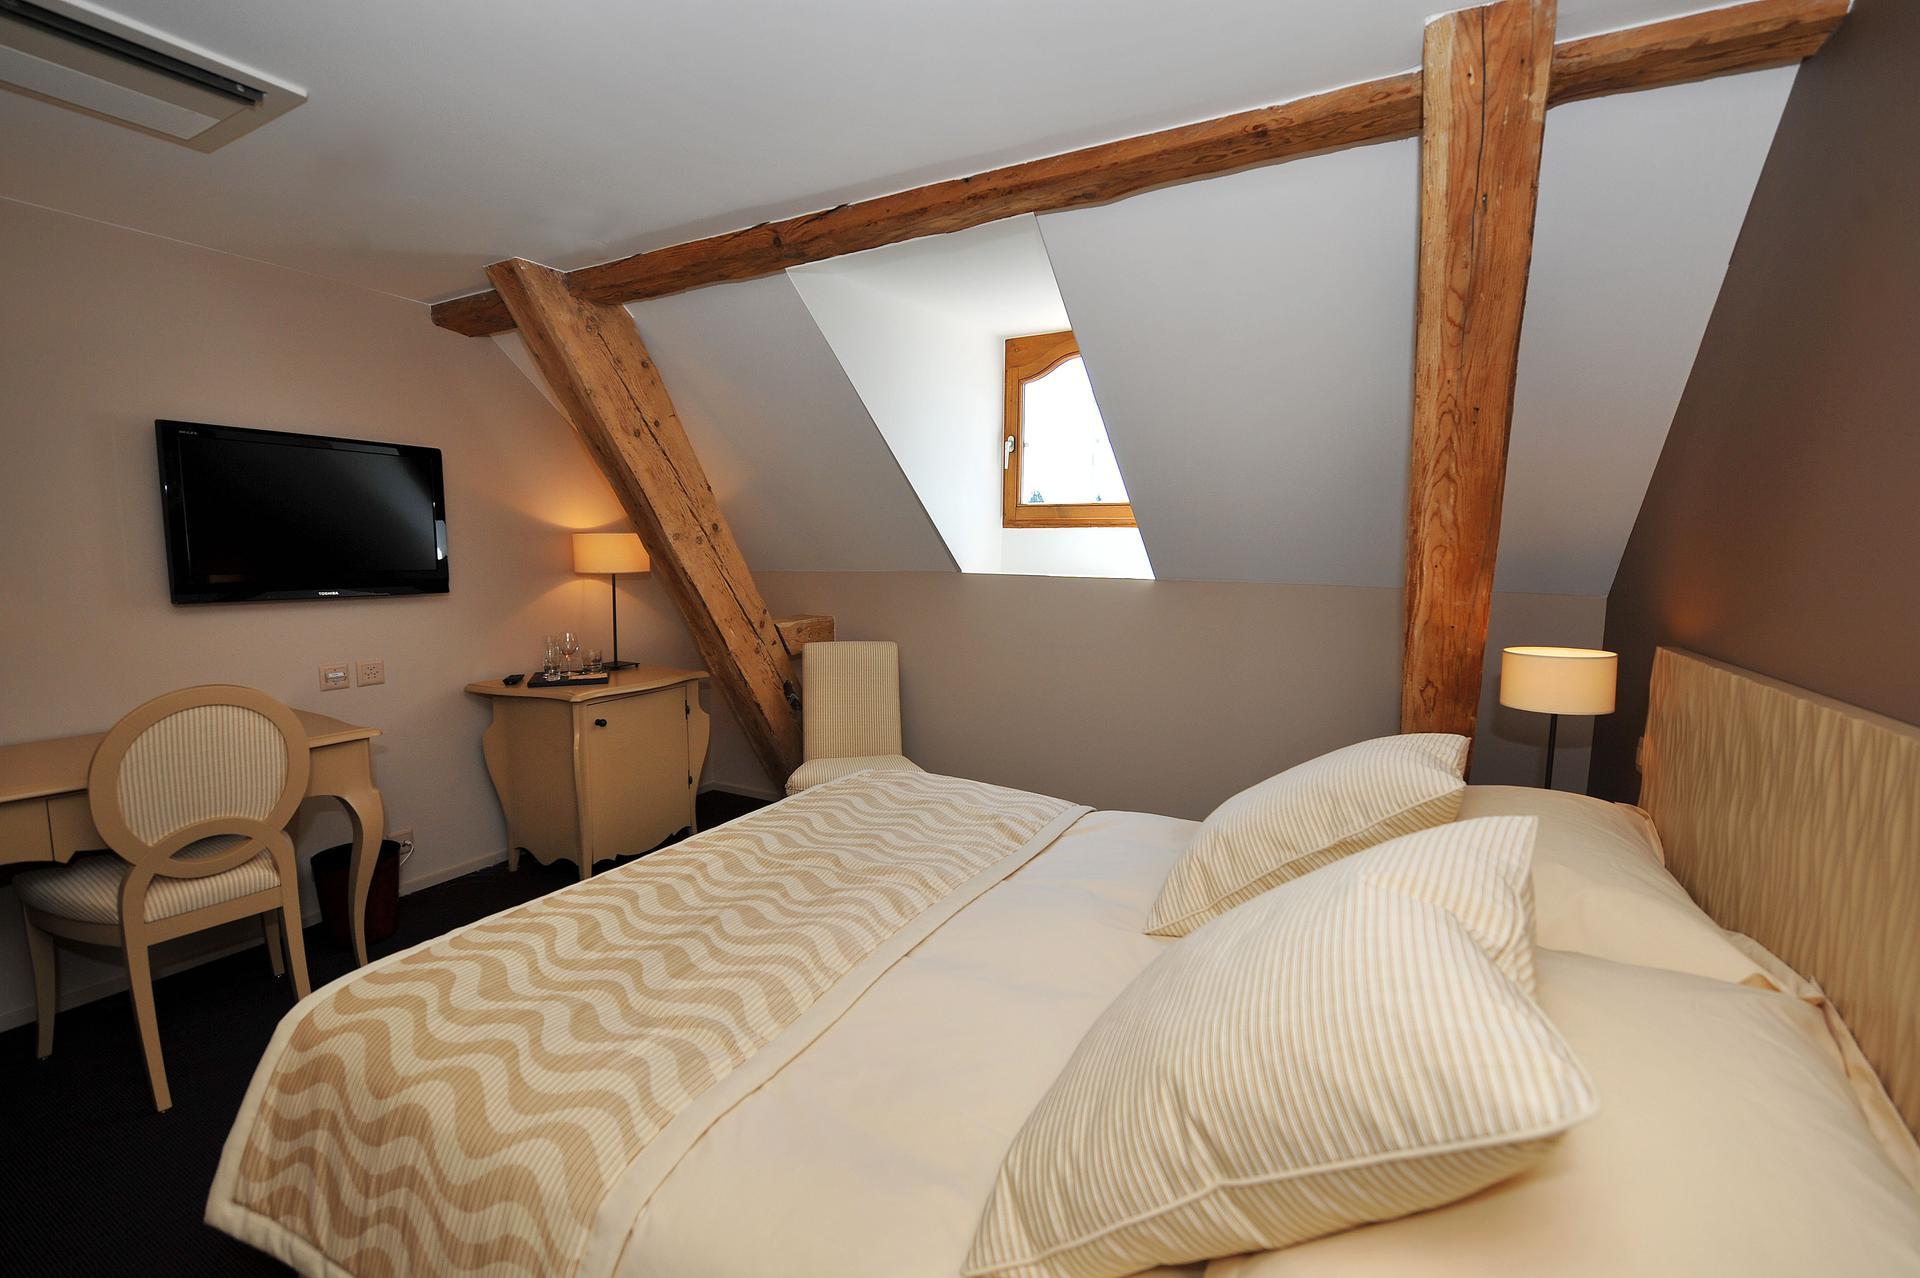 Hotellerie le Petit Manoir